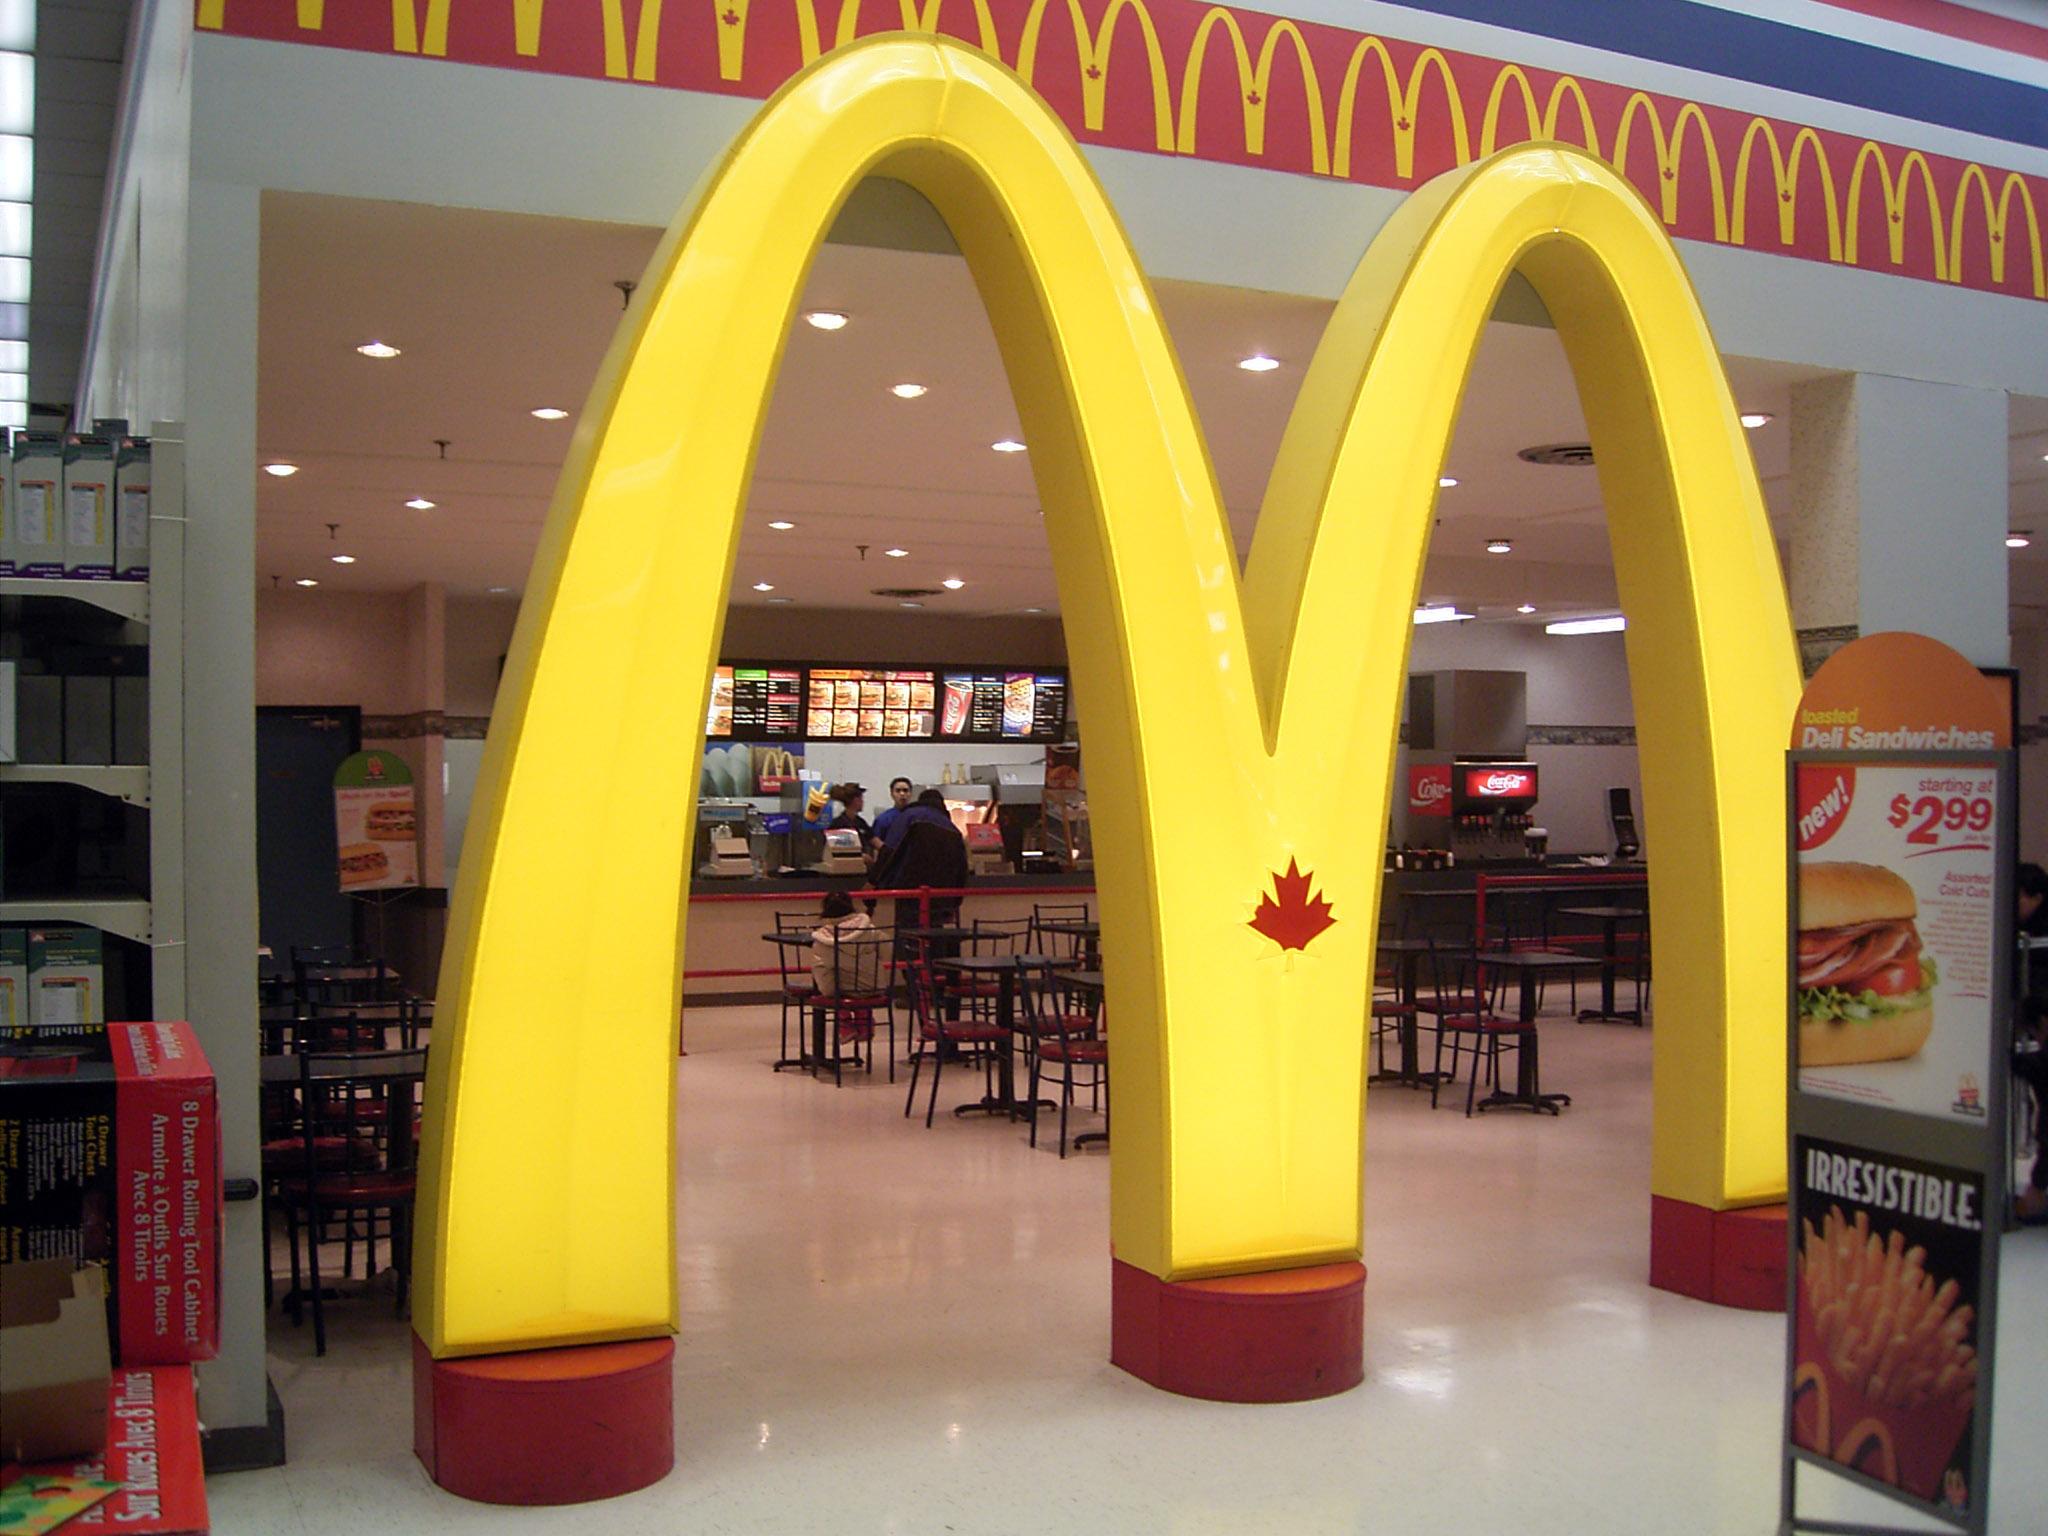 mcdonalds 2012 2013 2 essay Swot analysis of mcdonalds mcdonalds swot analysis 2013 strengths 1 largest fast food market share in the world 2 largest fast food market share in the world 2 brand recognition valued at $40 billion 3 $2 billion advertising budget 4.